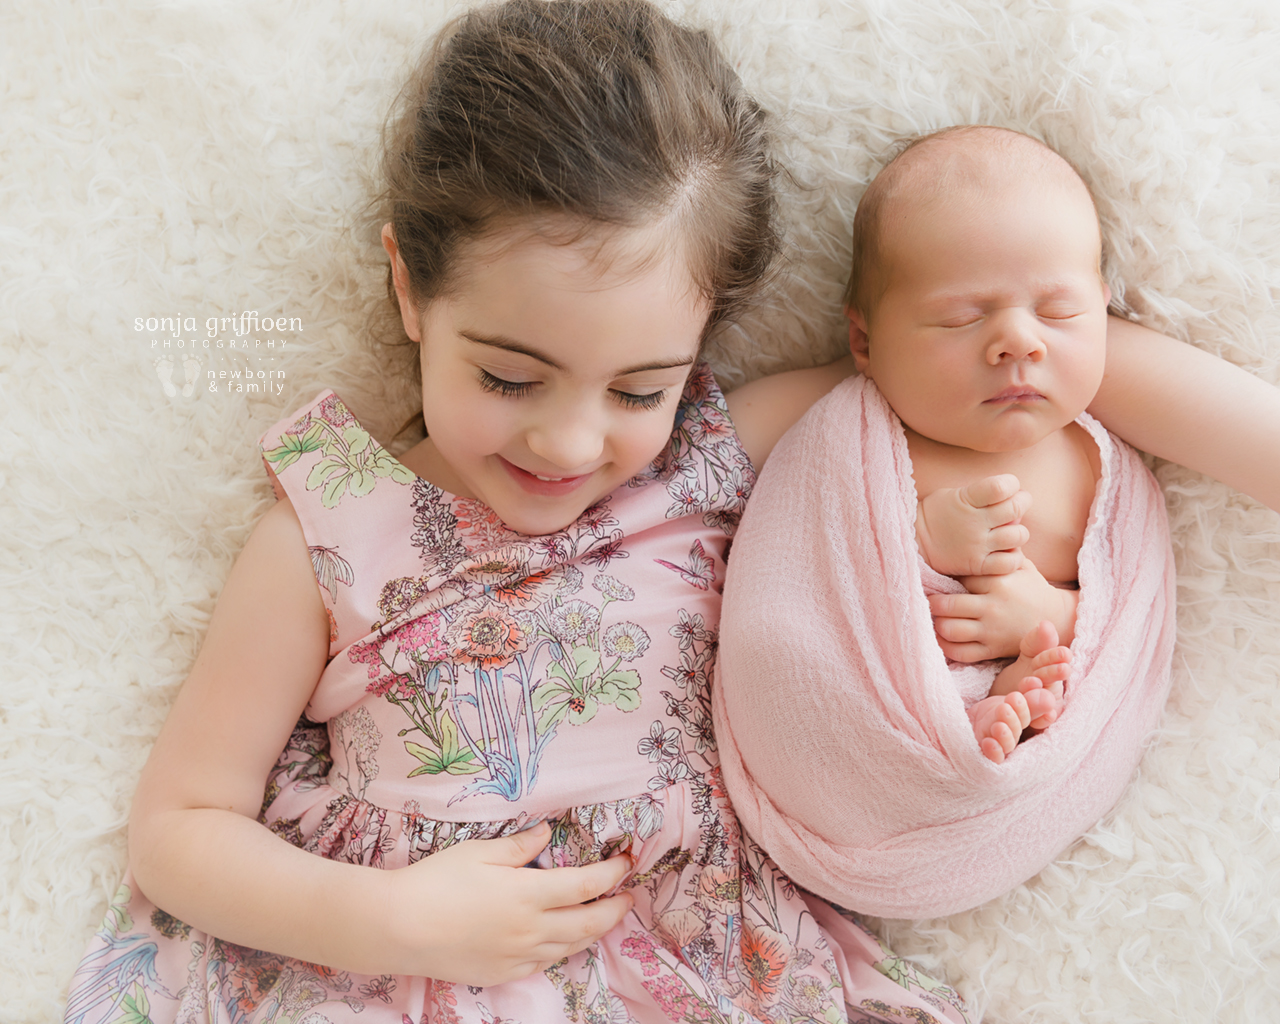 Nieve-Newborn-Brisbane-Newborn-Photographer-Sonja-Griffioen-02.jpg